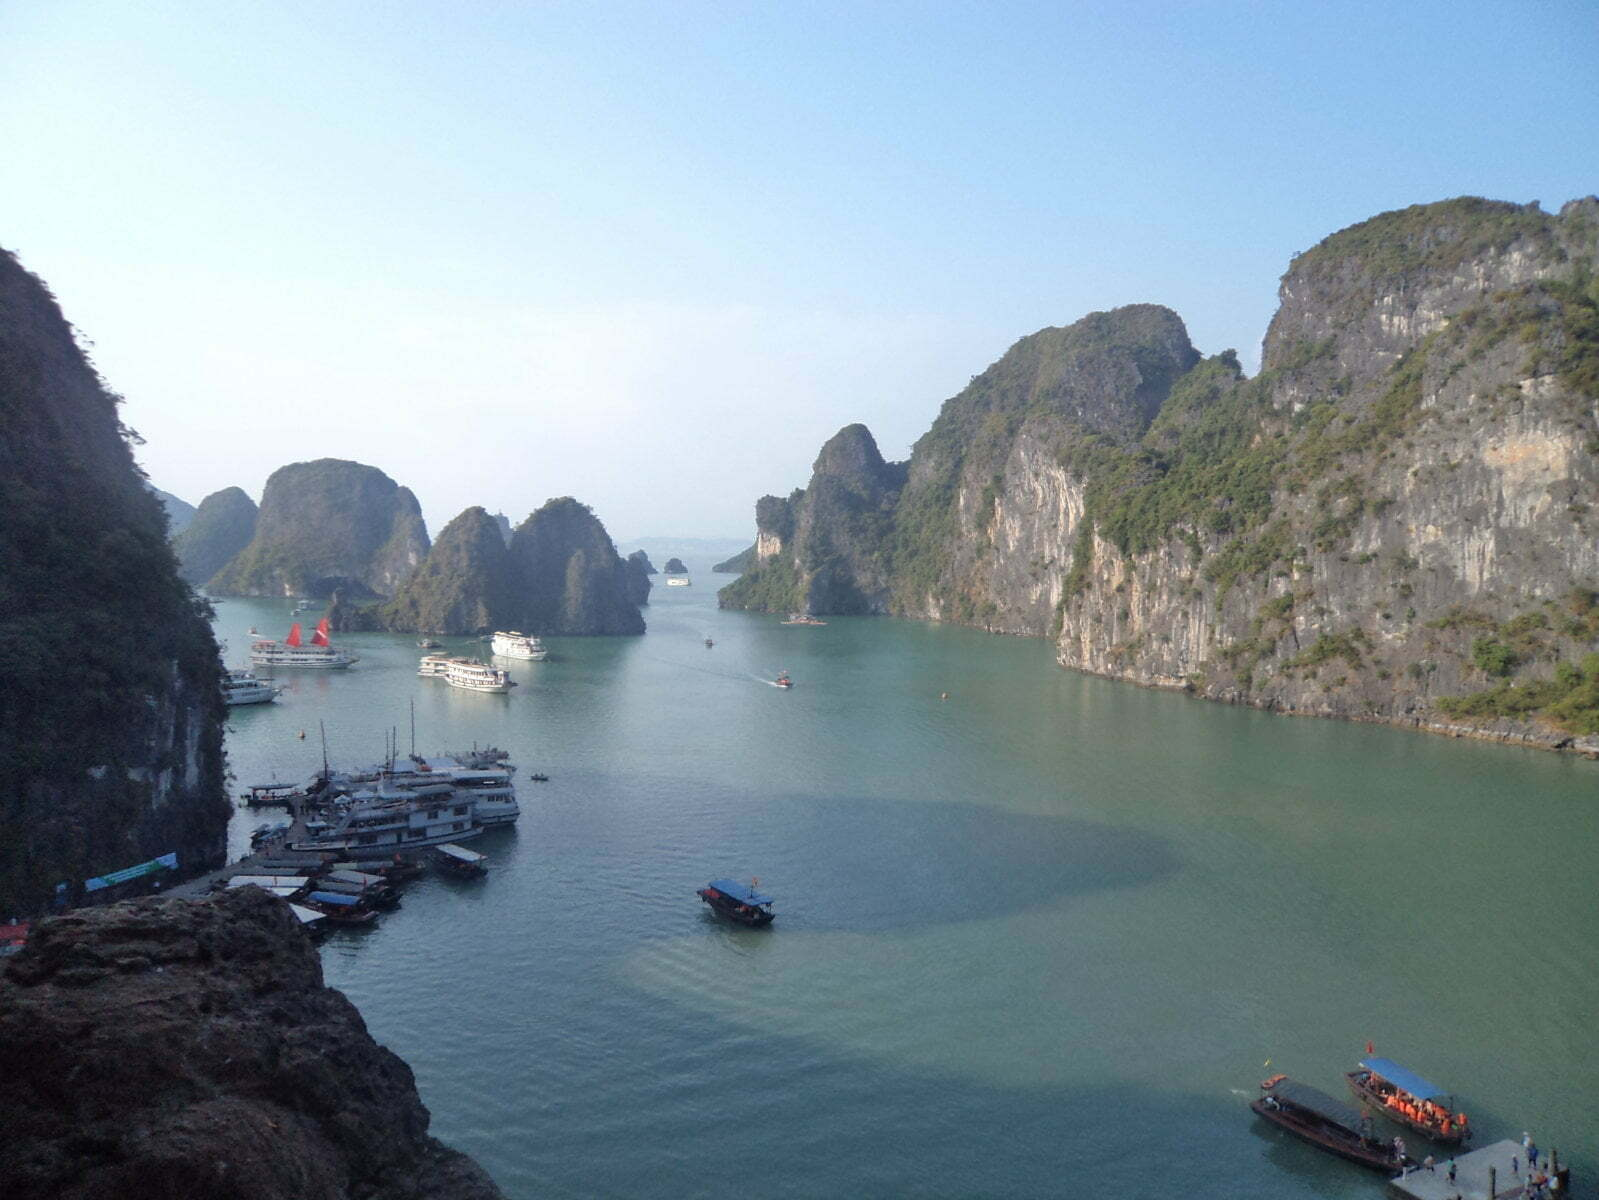 Vista da Luan Cave - Ha Long Bay, próximo a Hanoi, Vietnã